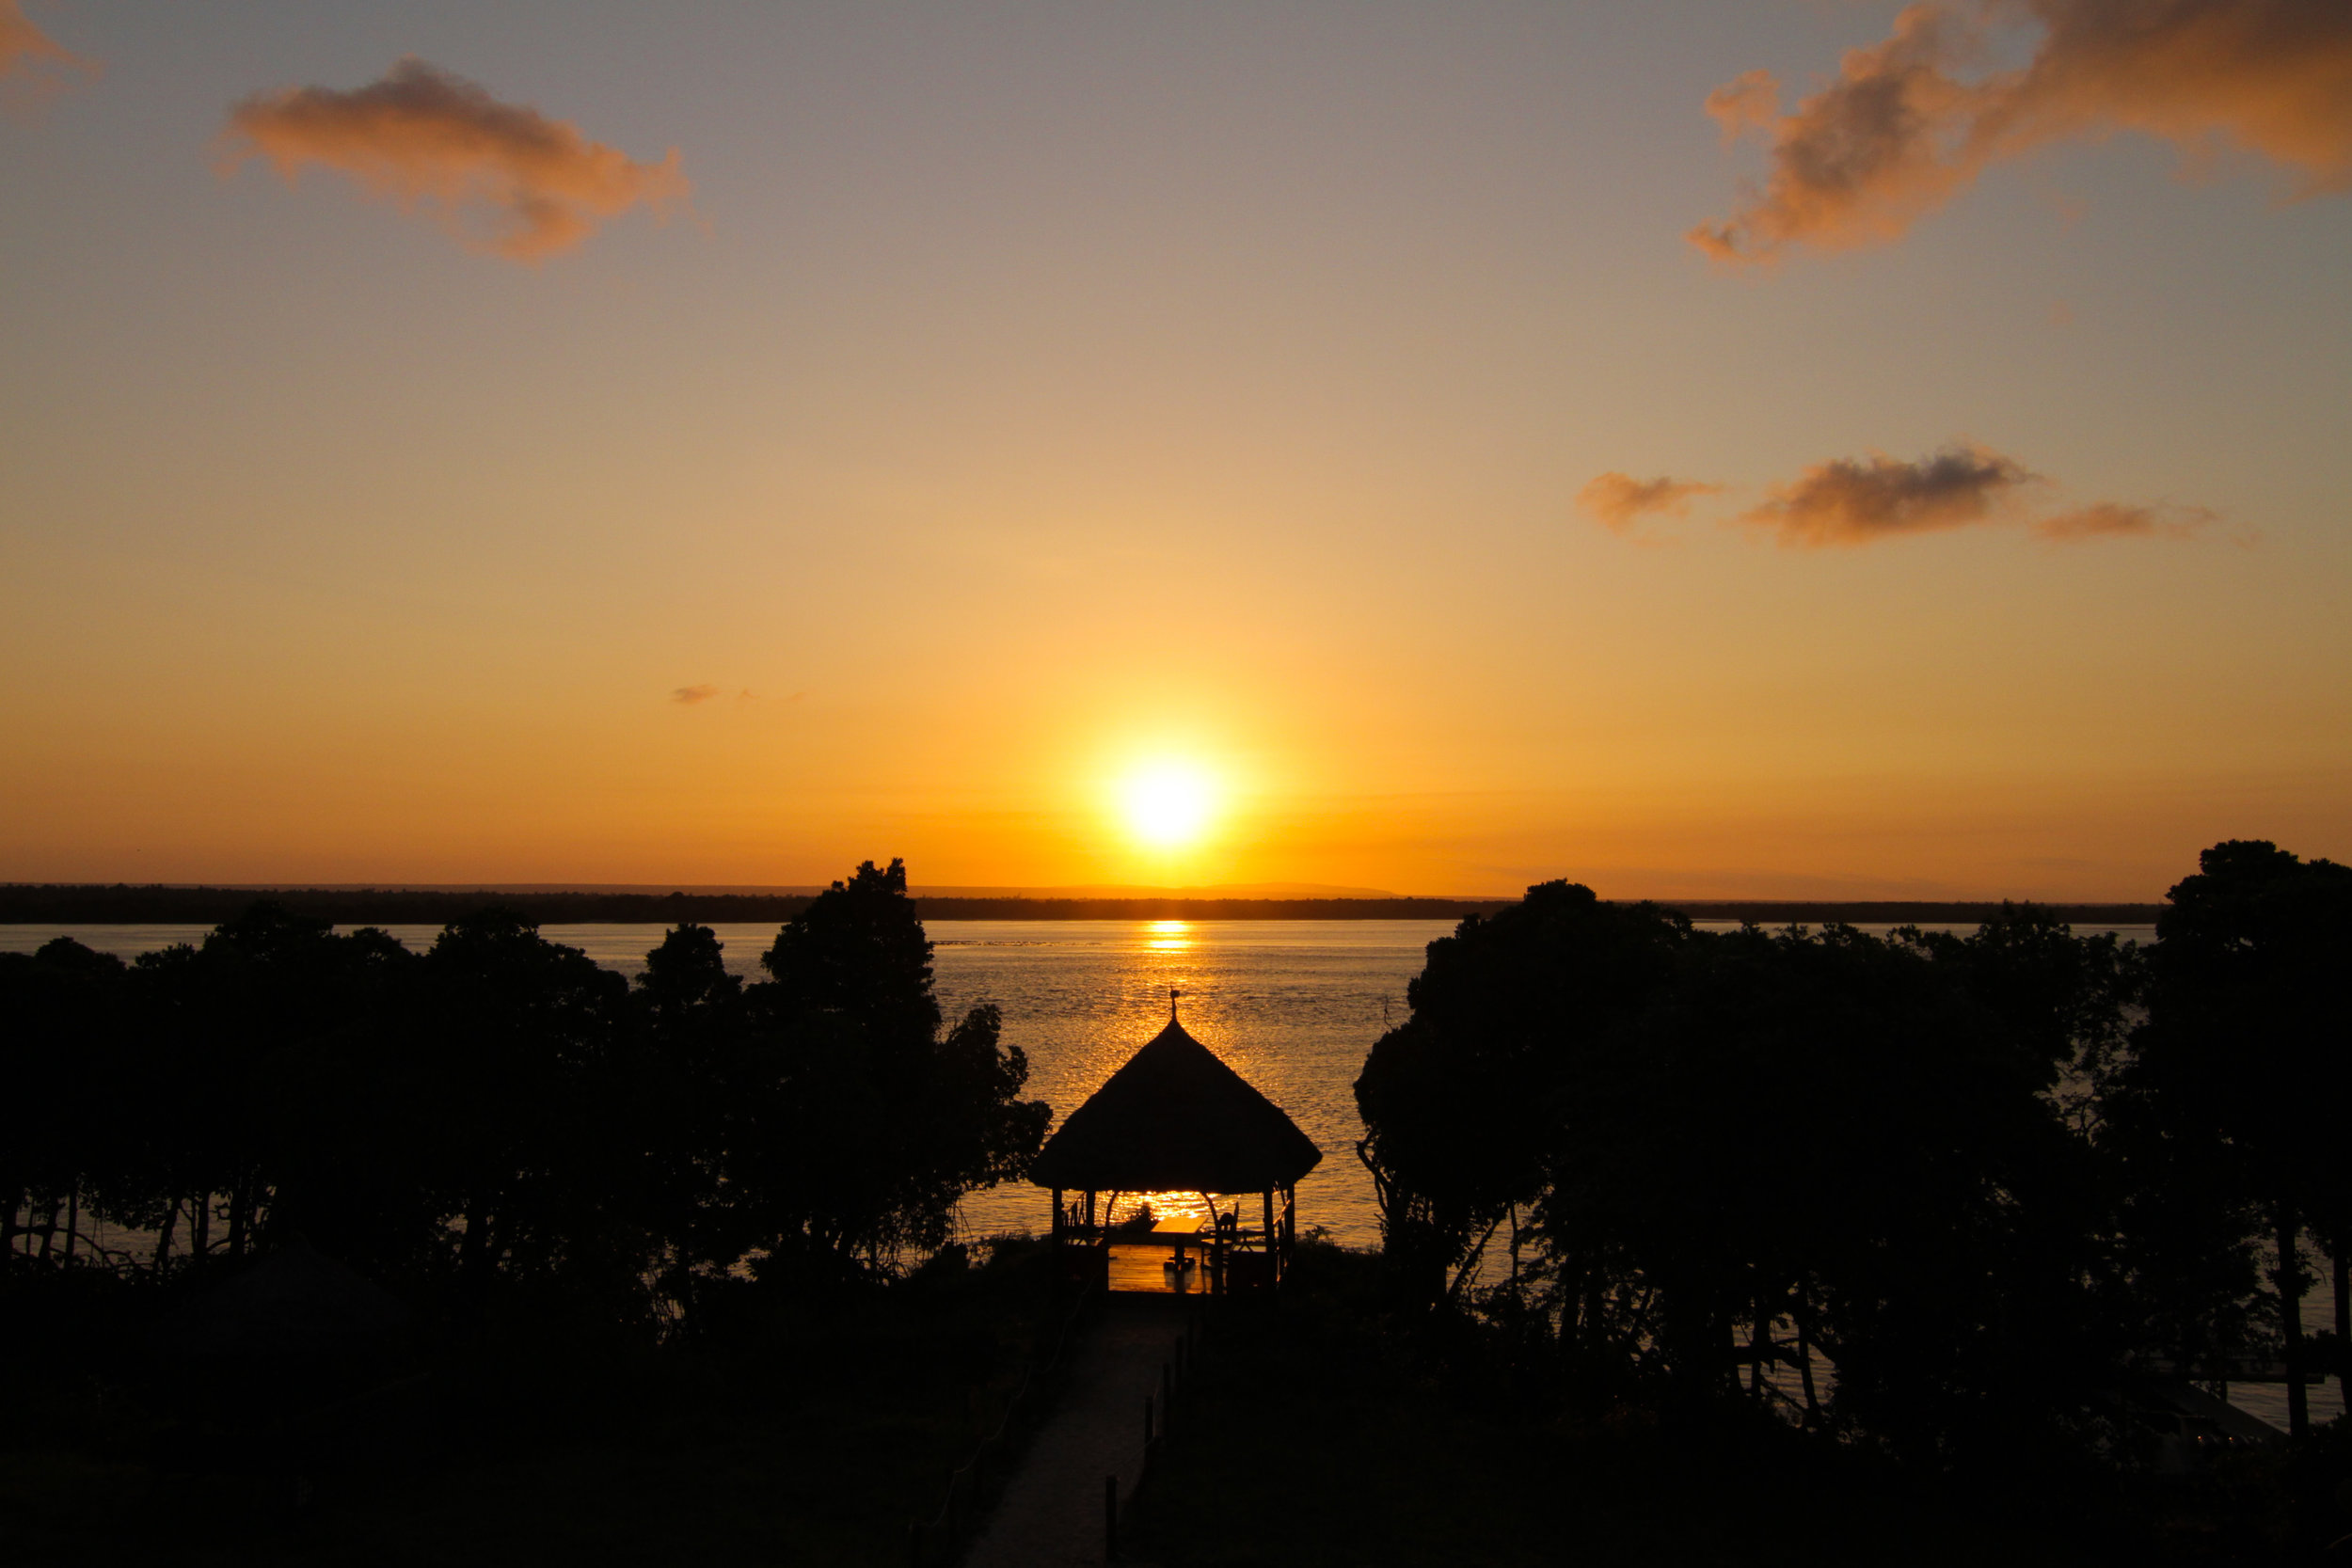 Sunset-Honeymoon-Pavilion-7927.jpg